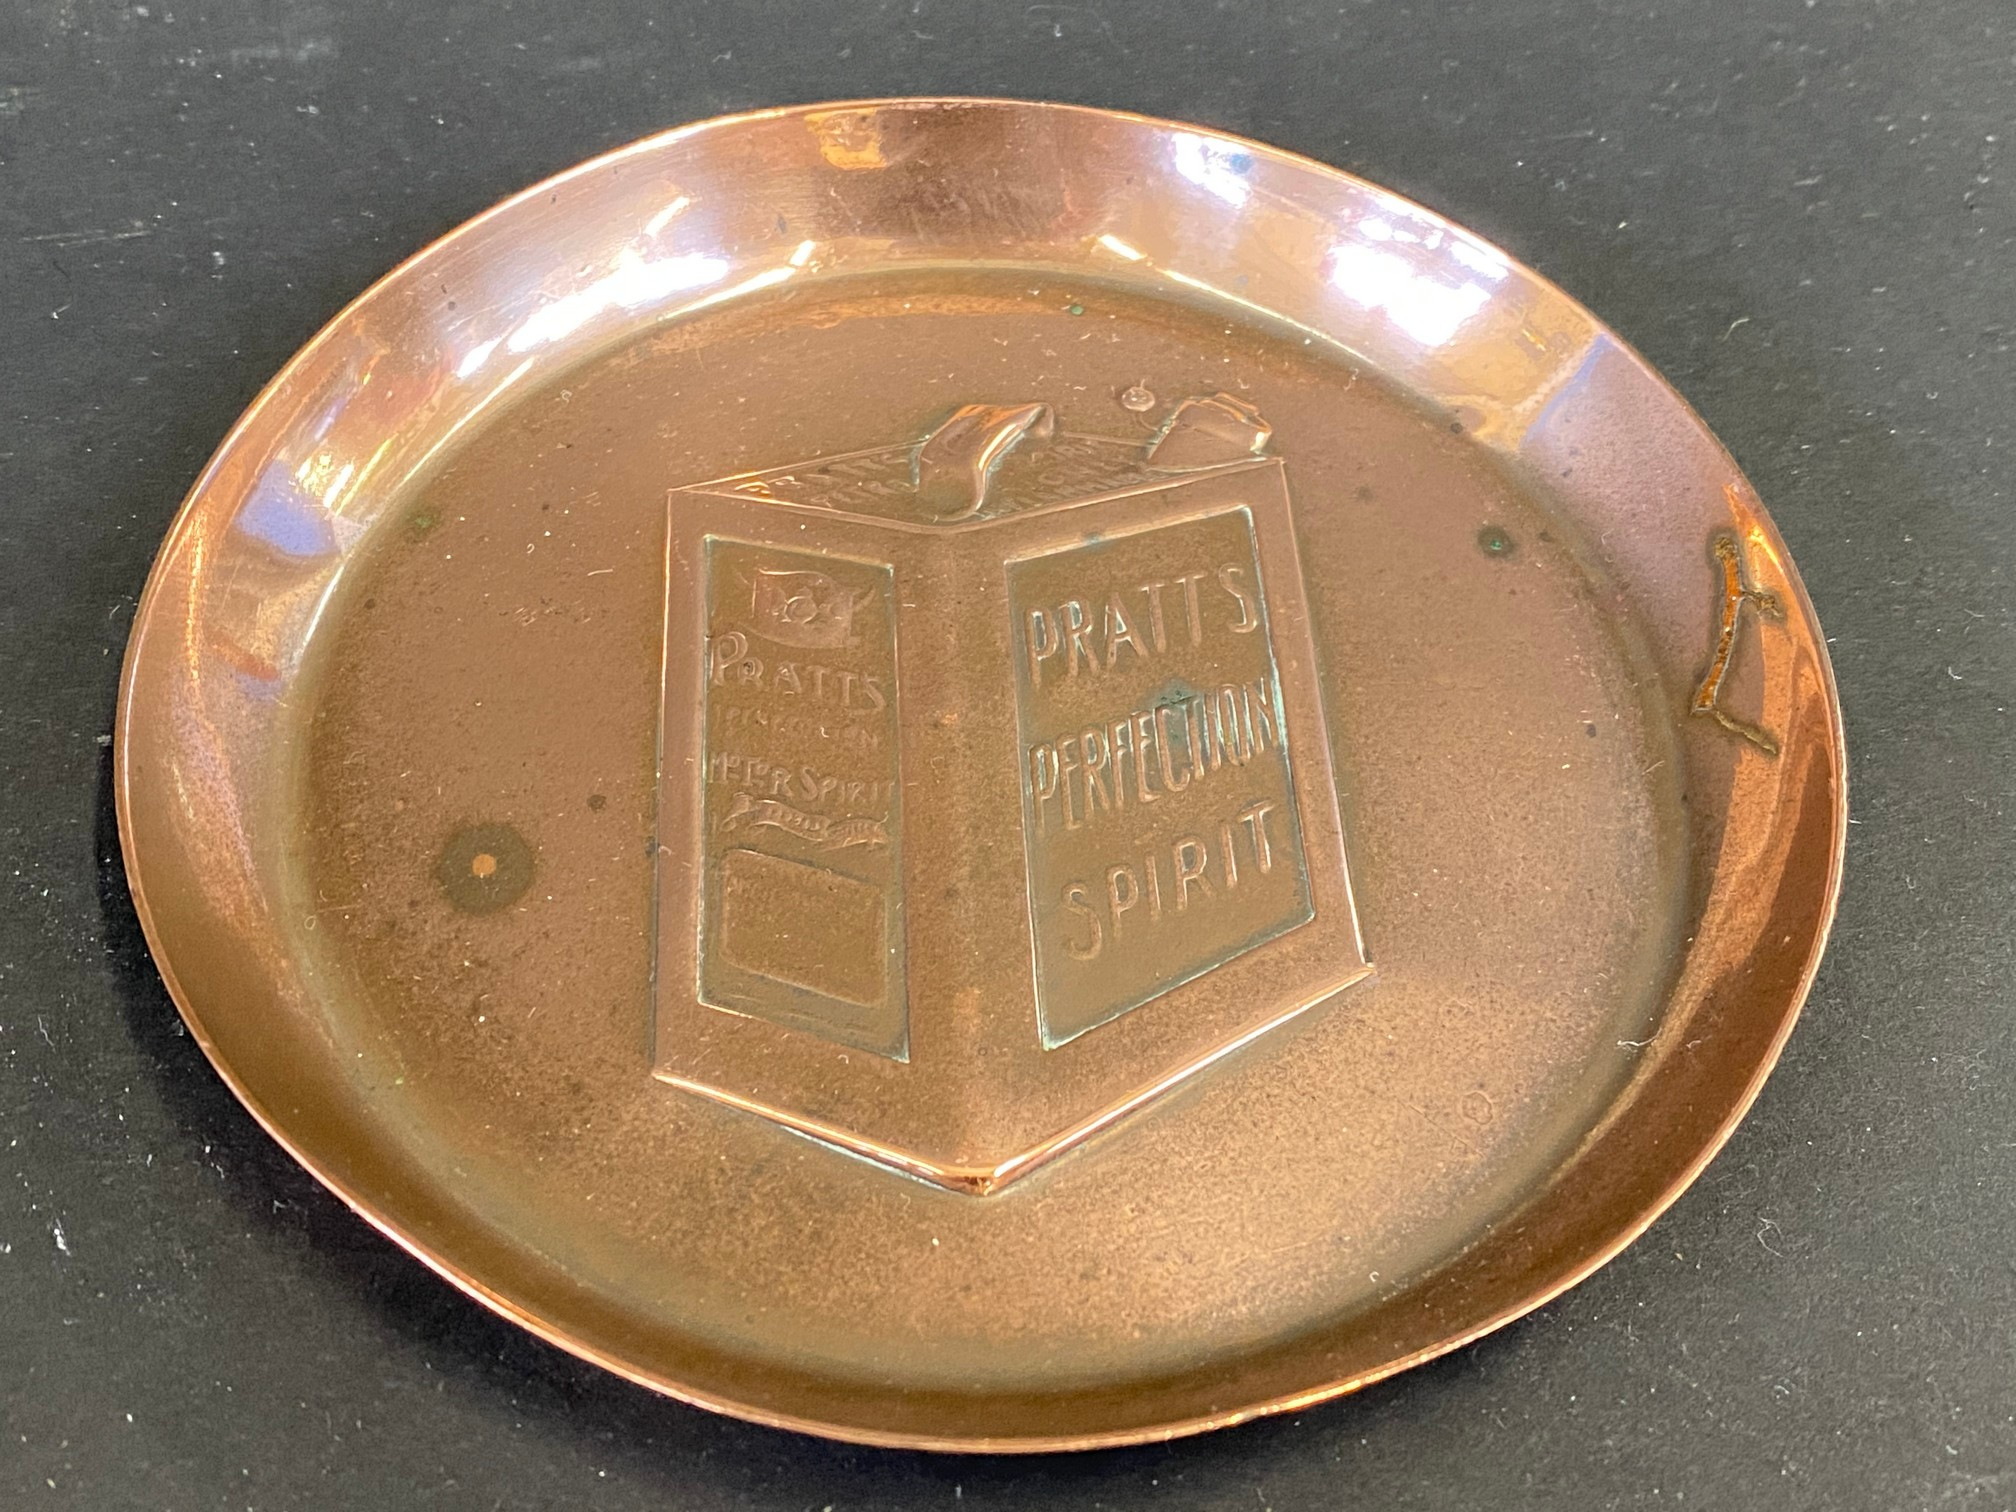 A copper ashtray advertising Pratt's Perfection Spirit, stamped J.S&S.